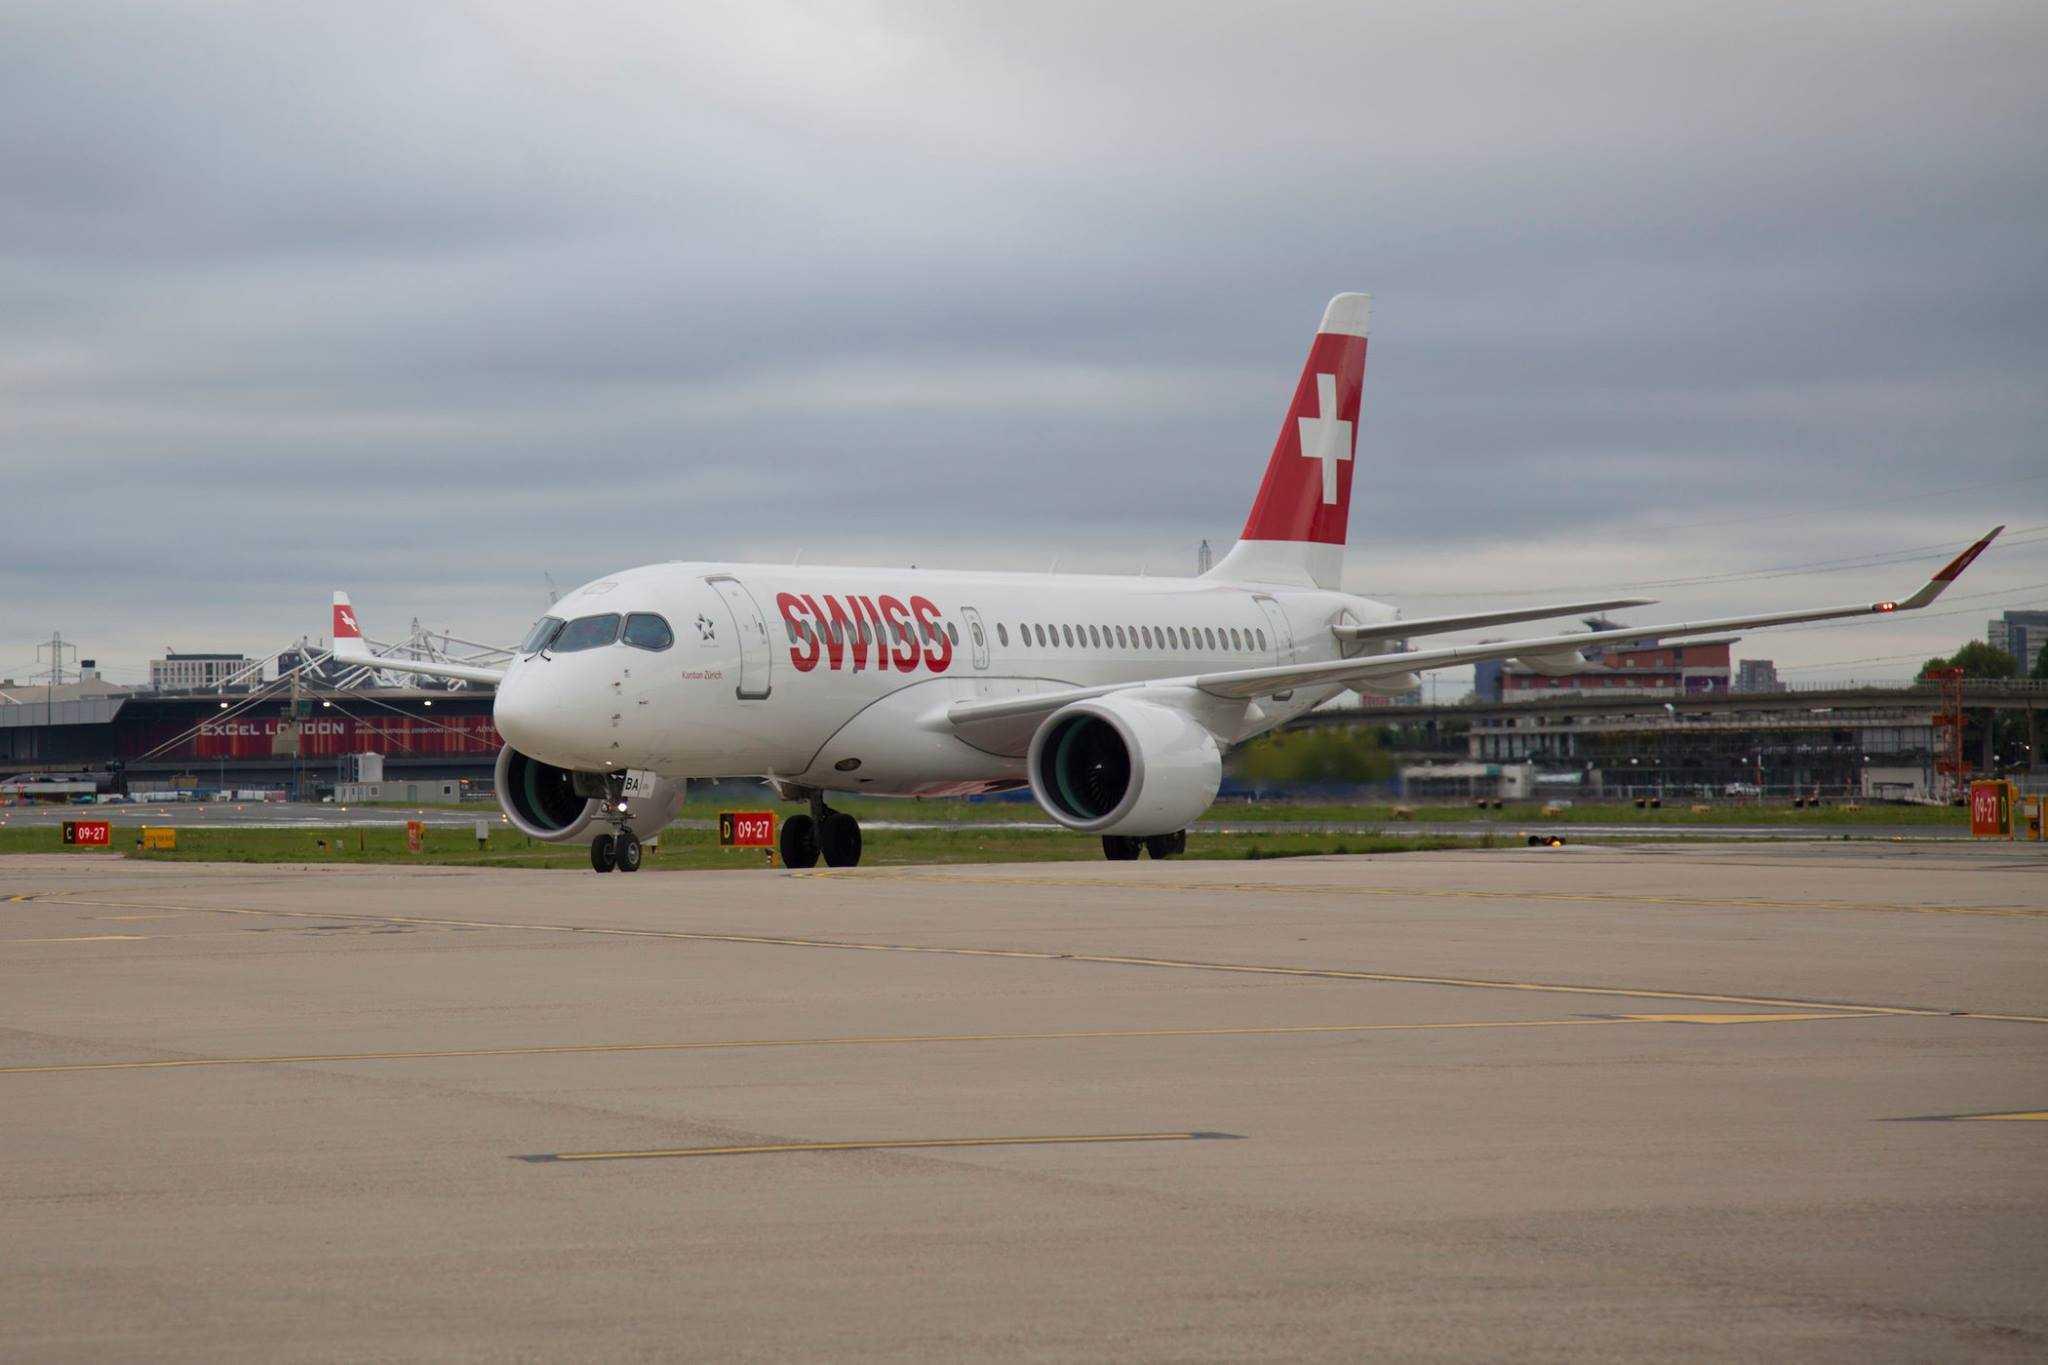 Bombardier-CS100-SWISS-Лондон-Сити